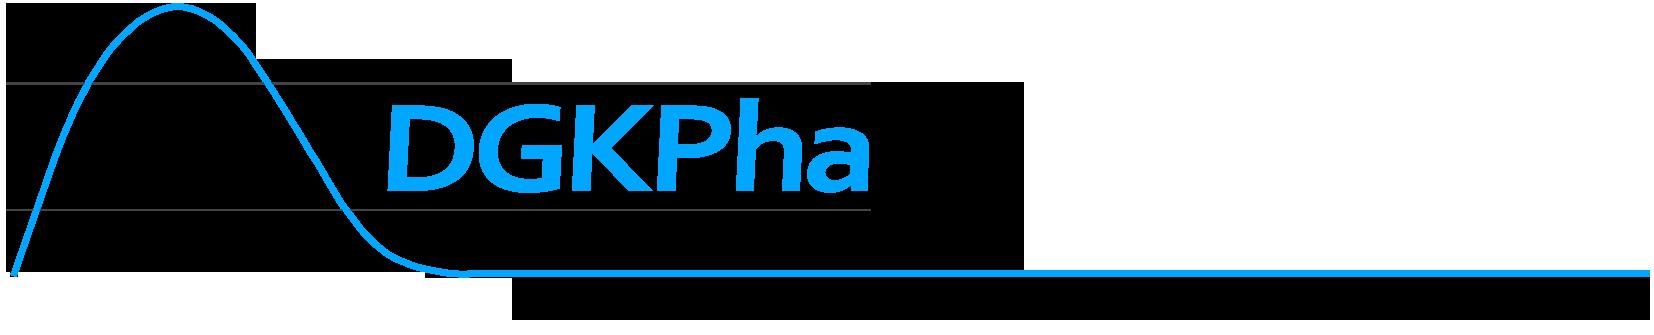 DGKPha Logo